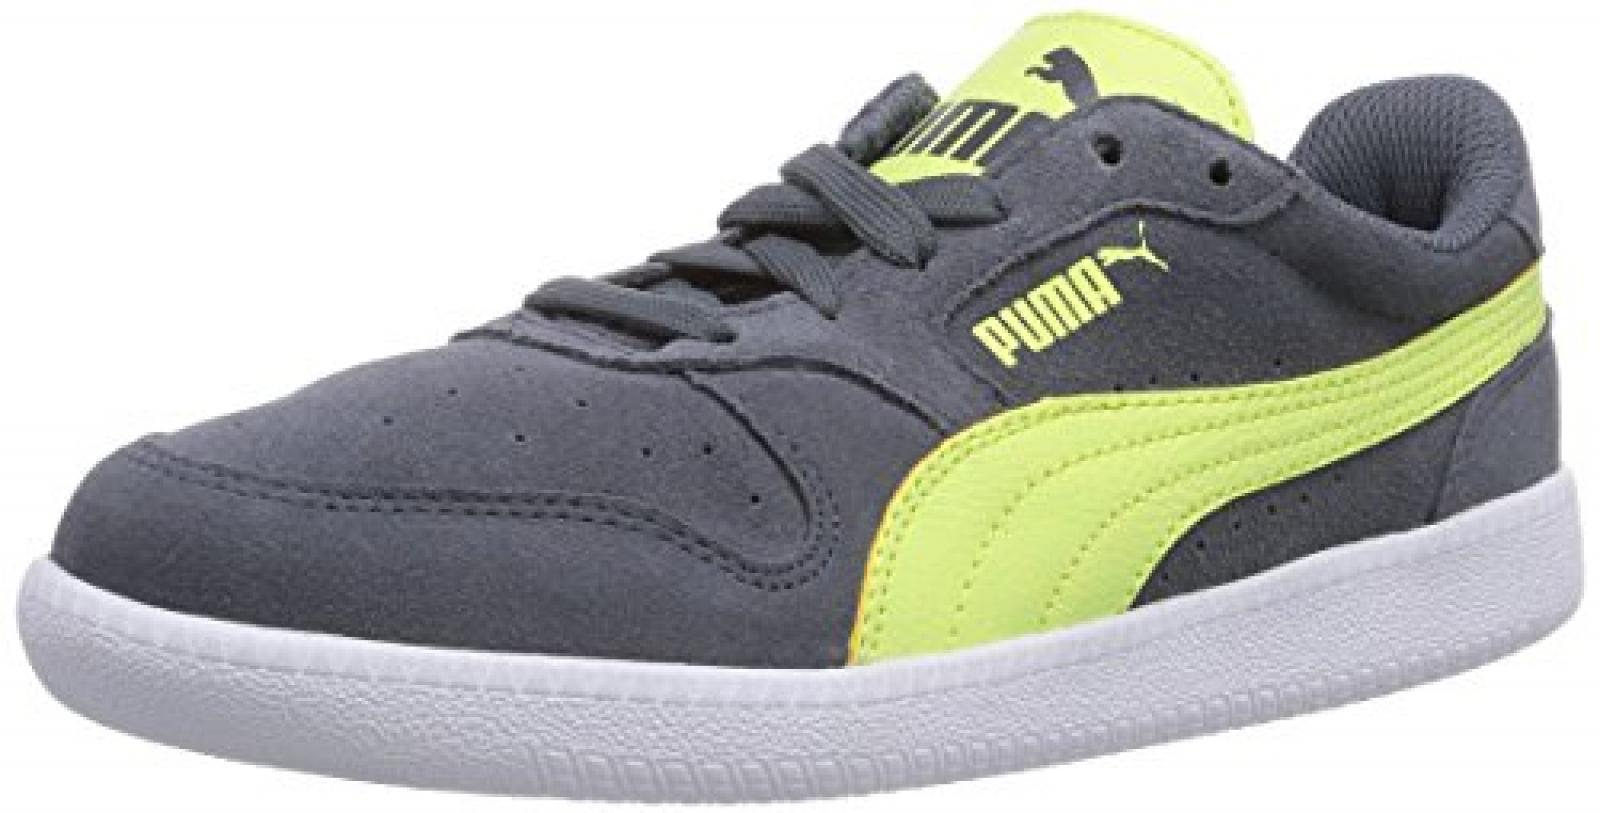 Puma Icra Trainer SD Unisex-Erwachsene Sneakers